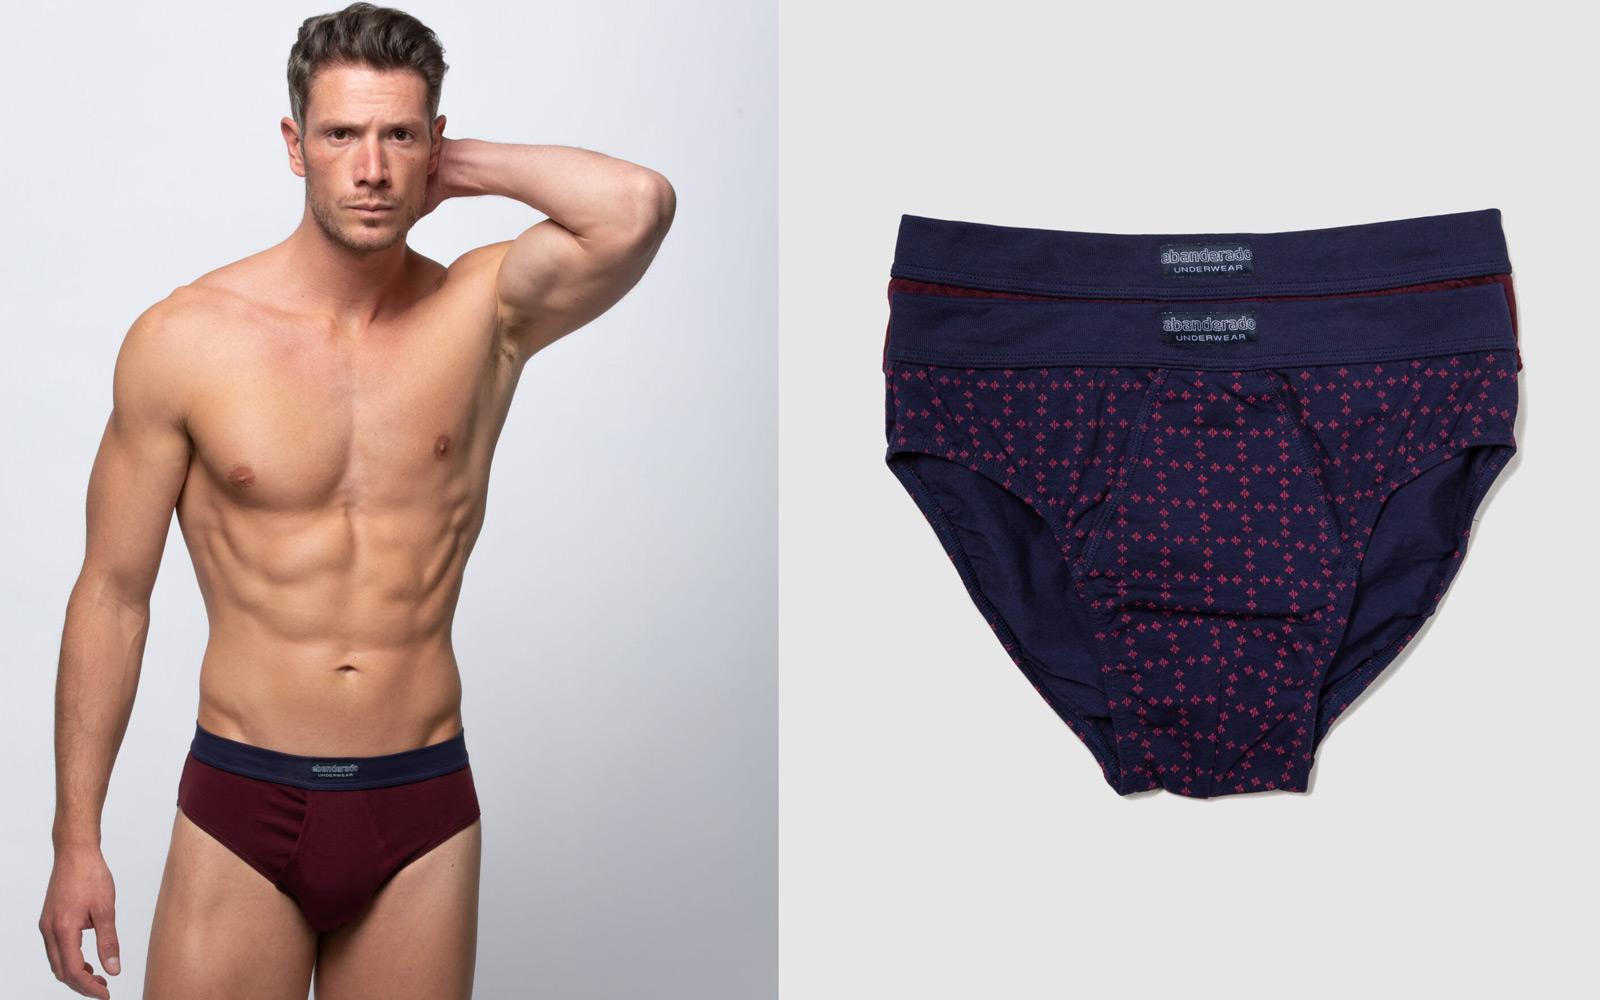 colores cálidos en ropa interior de hombre